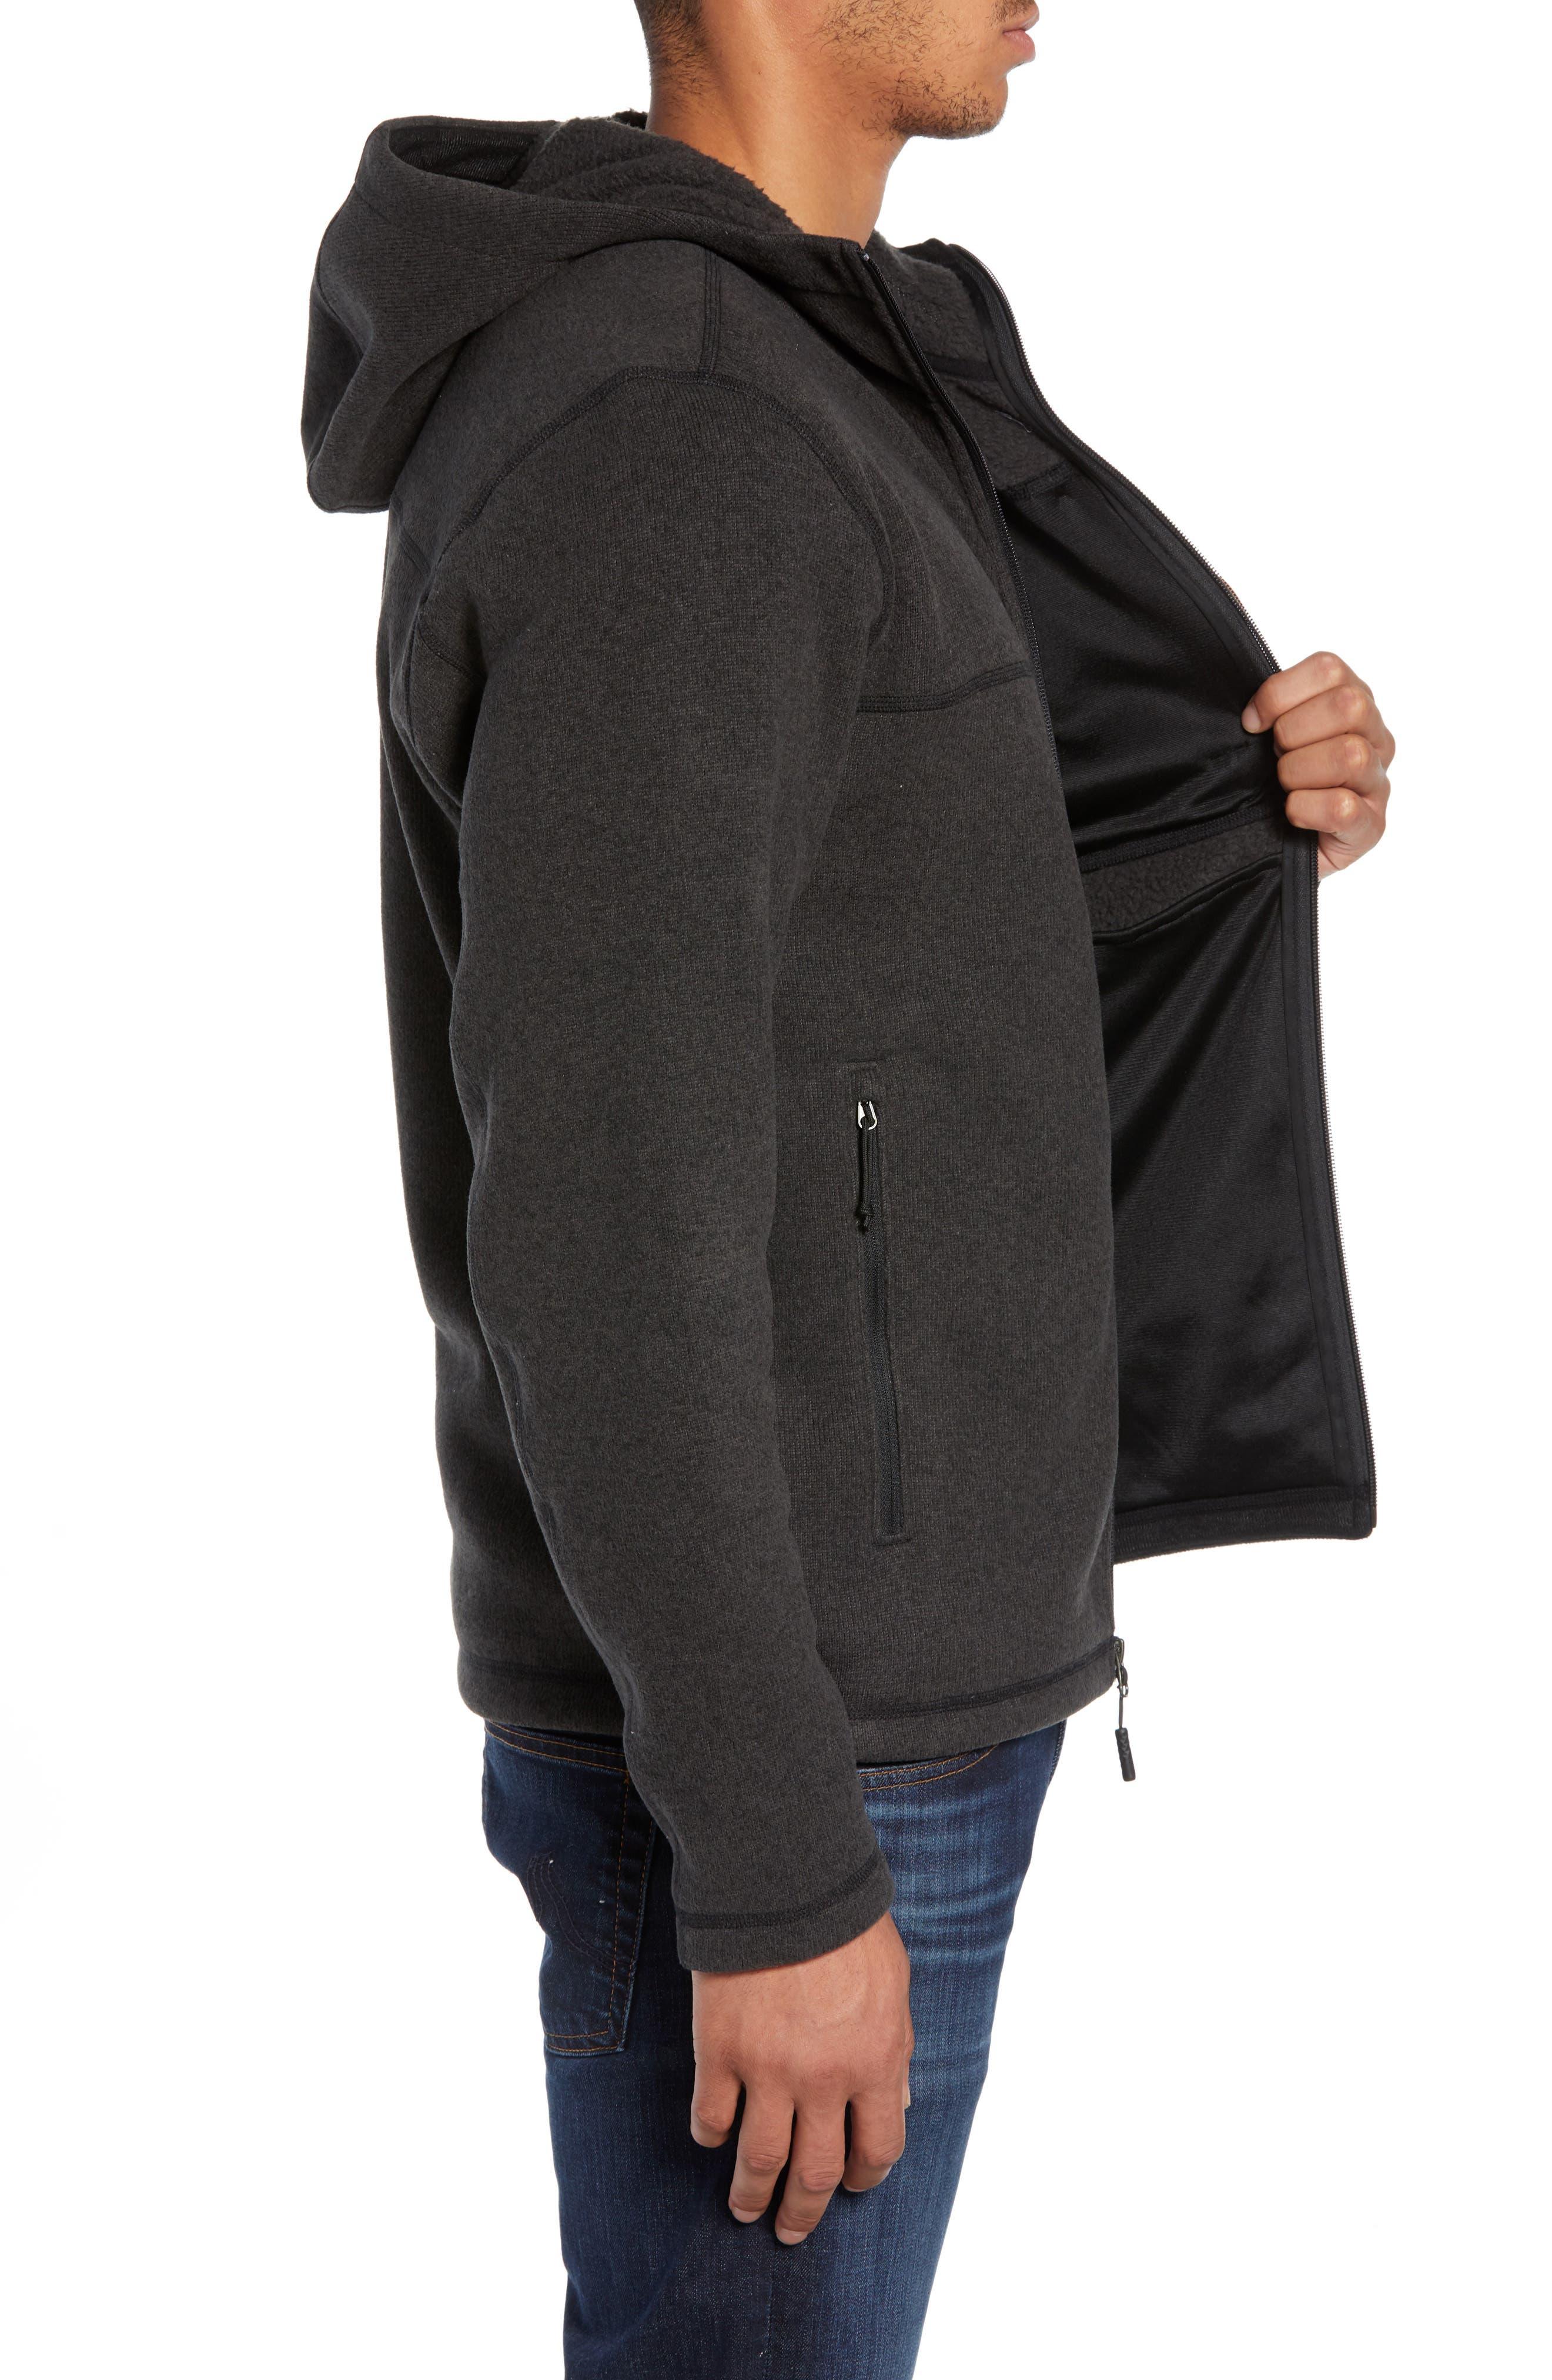 Gordon Lyons Relaxed Fit Sweater Fleece Hoodie,                             Alternate thumbnail 3, color,                             TNF BLACK HEATHER